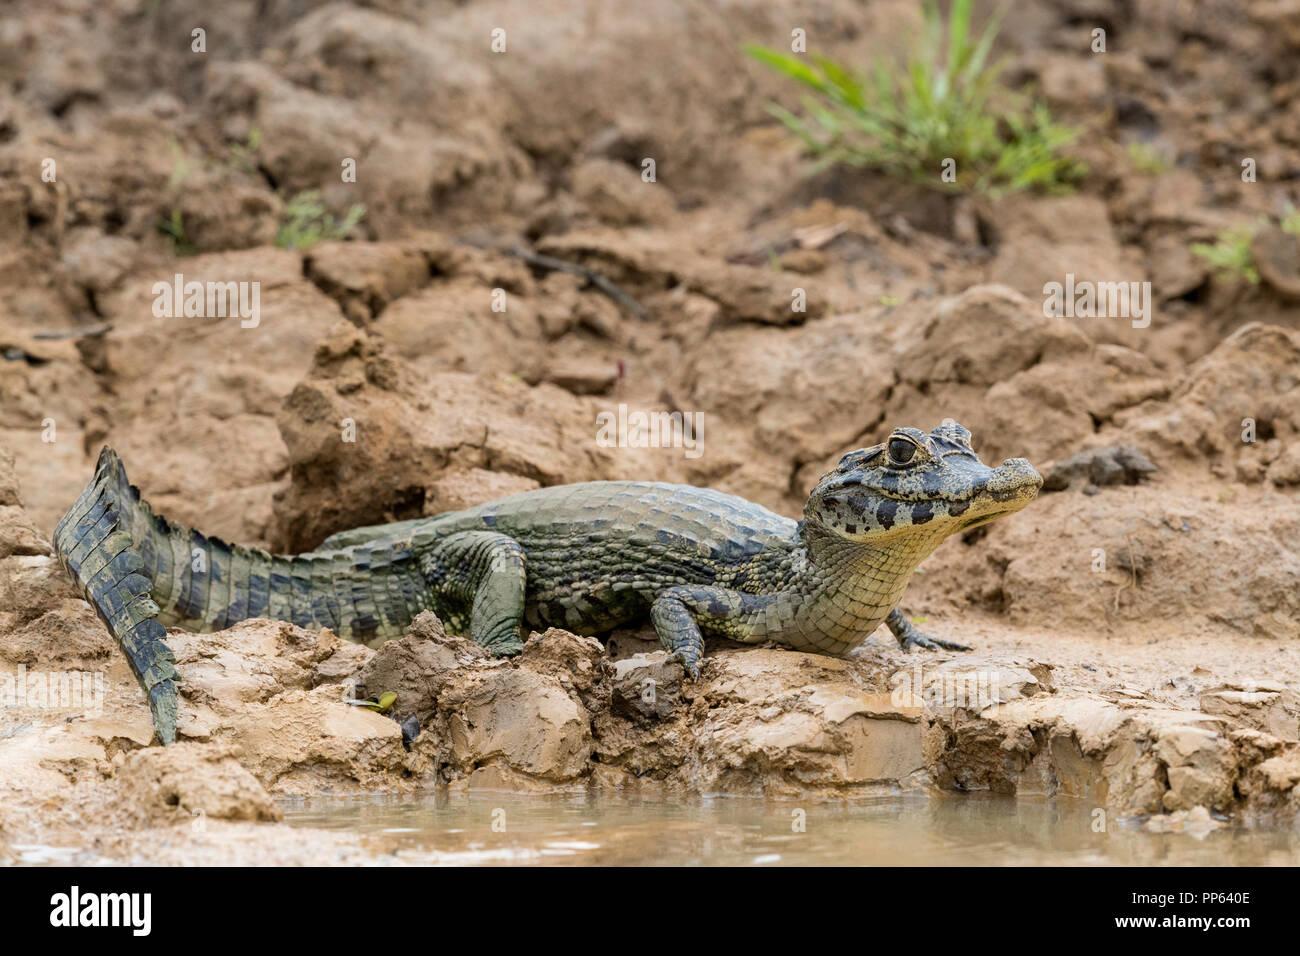 A young yacare caiman, Caiman yacare, on the riverbank near Porto Jofre, Brazil. - Stock Image